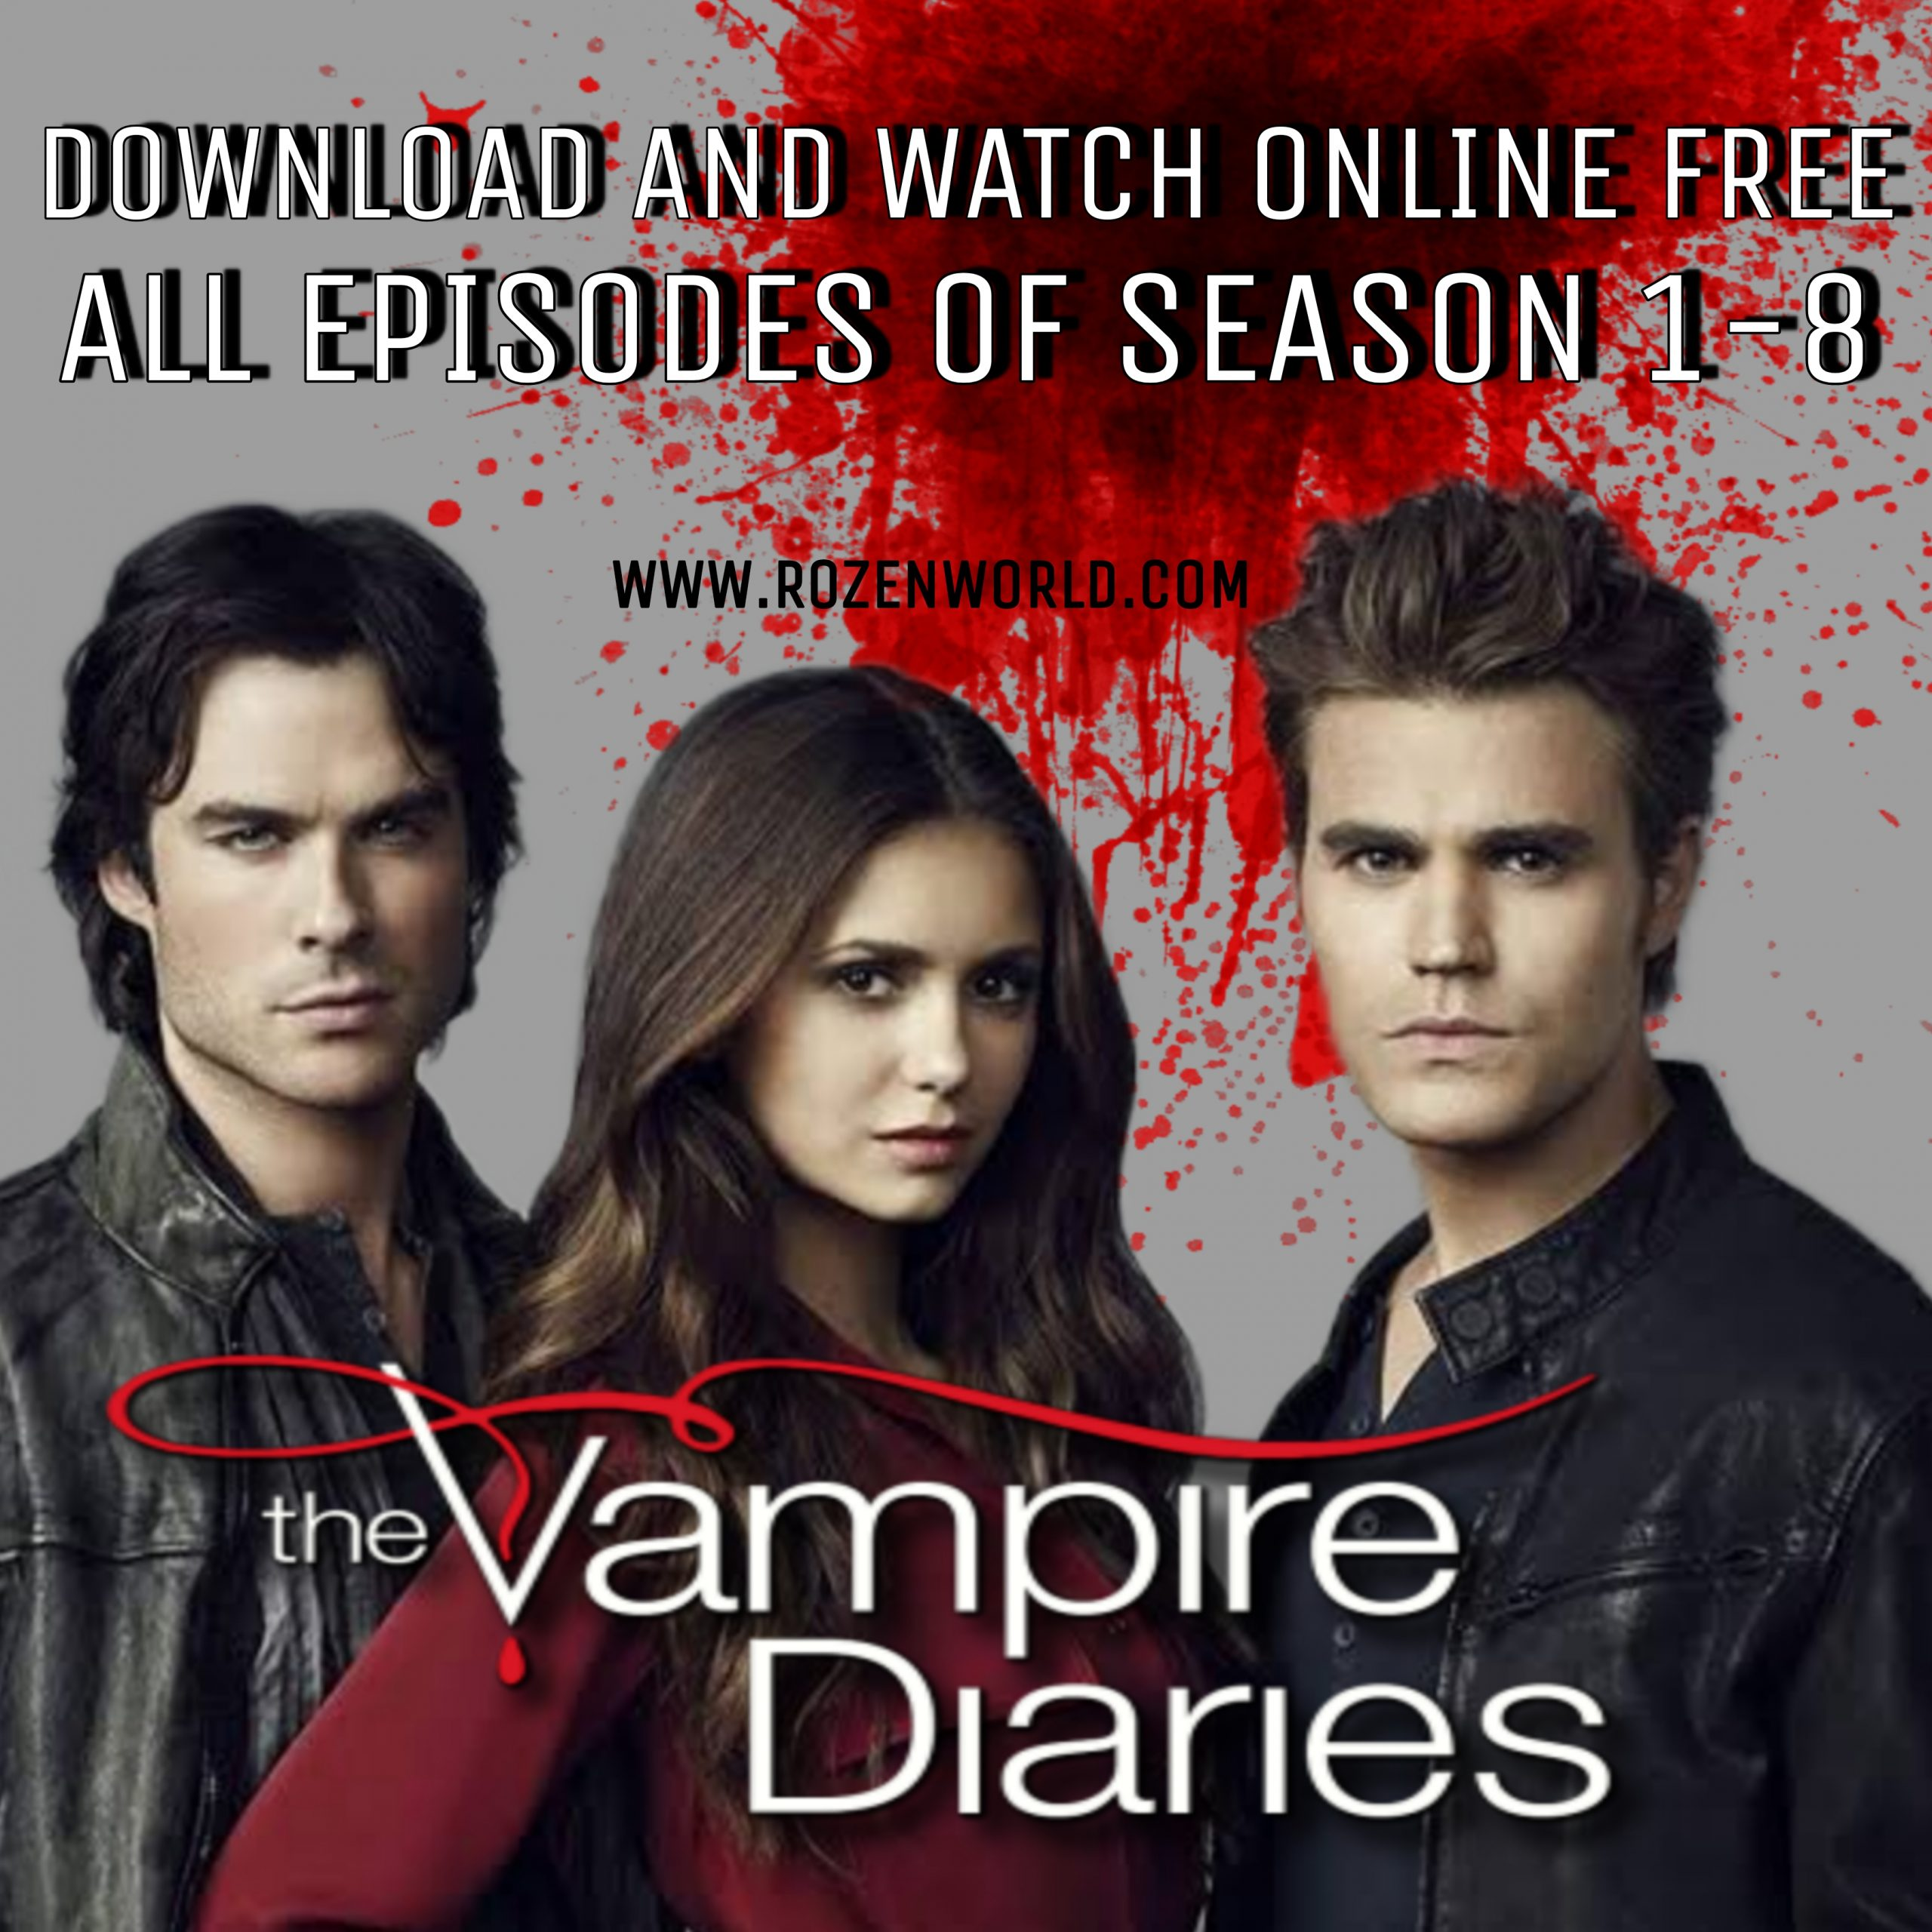 Vampire Diaries Download Telegram All Episodes of Season 1-8